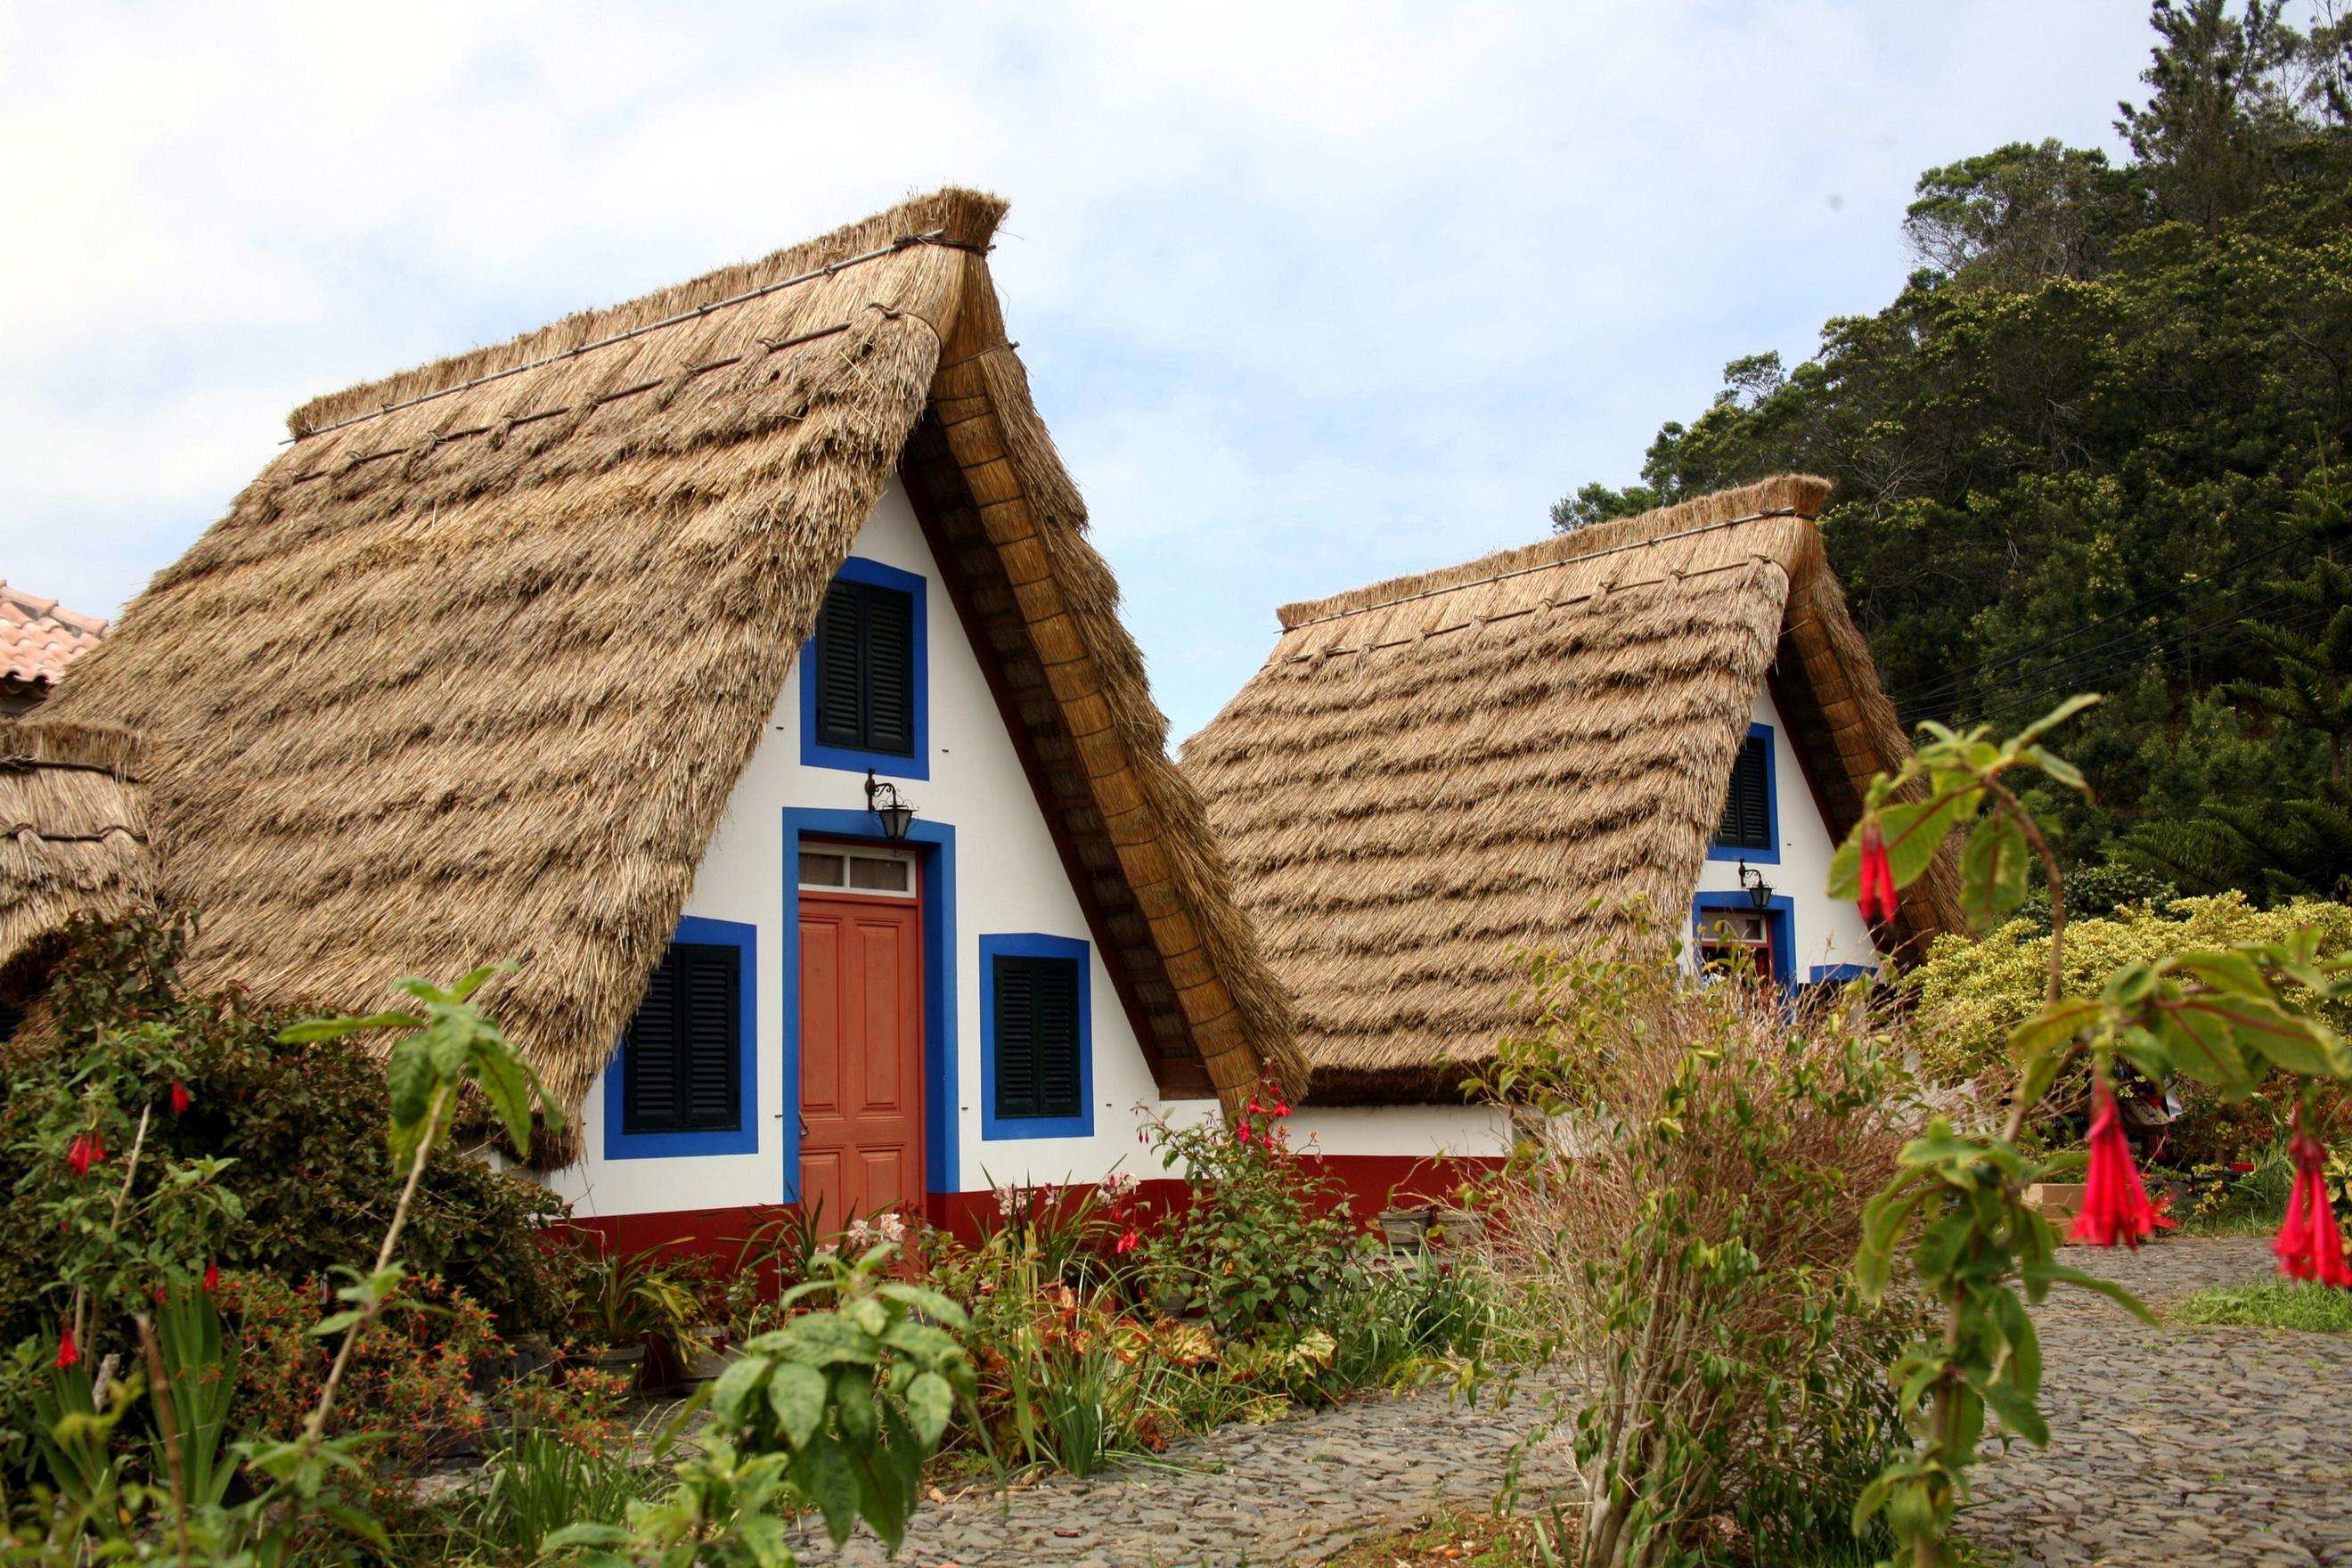 Hintergrundbilder portugal madeira santana haus st dte for Haus in madeira